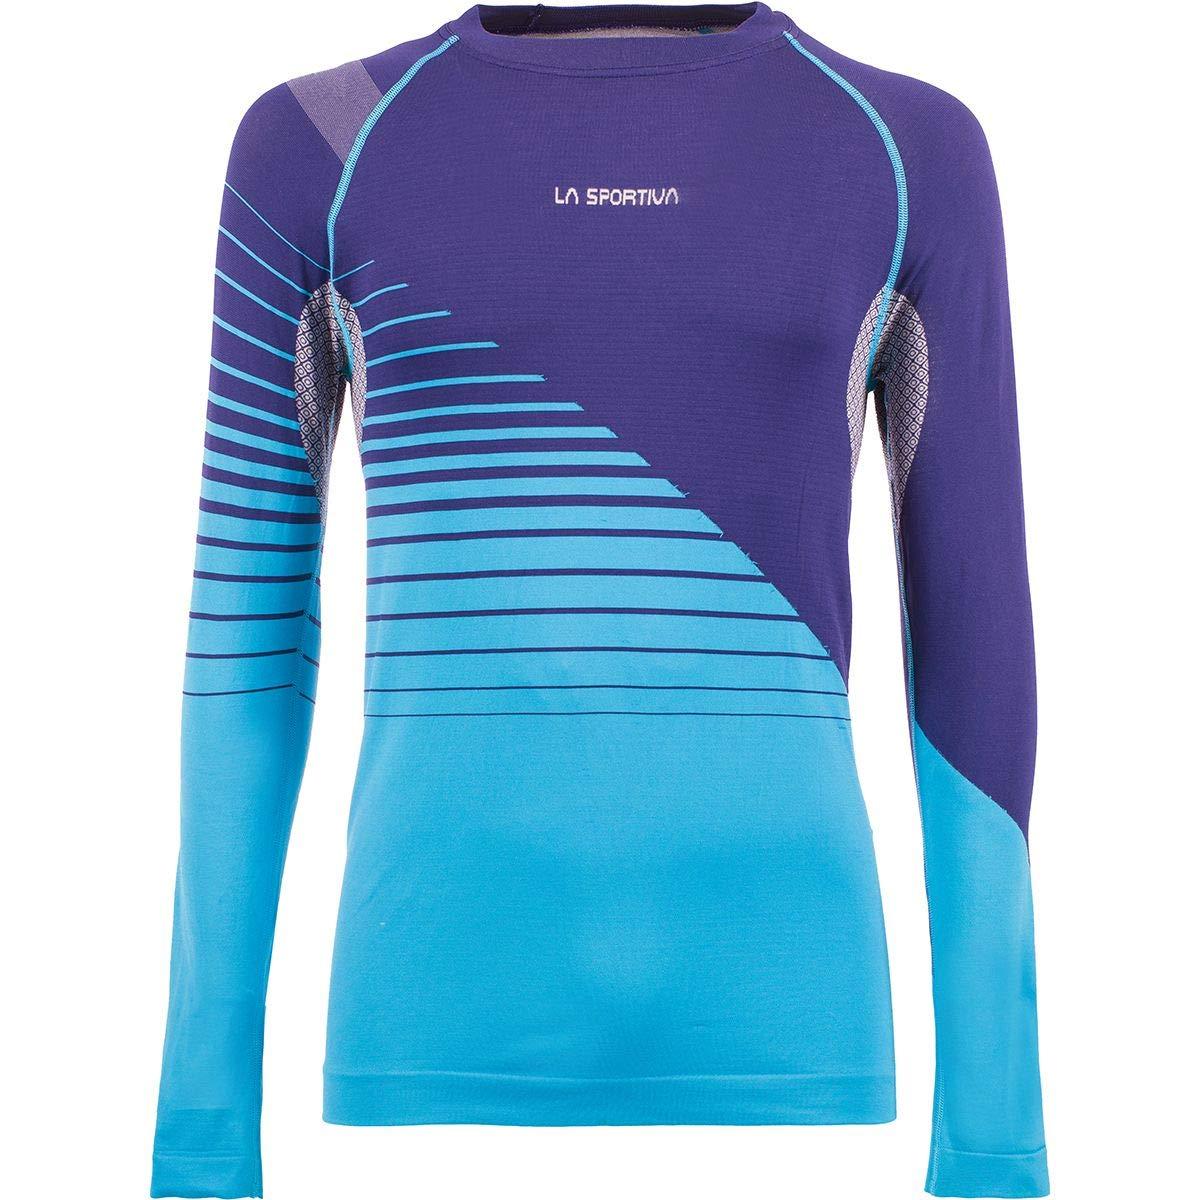 9bad9dfff4227a La Sportiva Artic Long Sleeve M Thermo-Shirt, Herren: Amazon.de ...